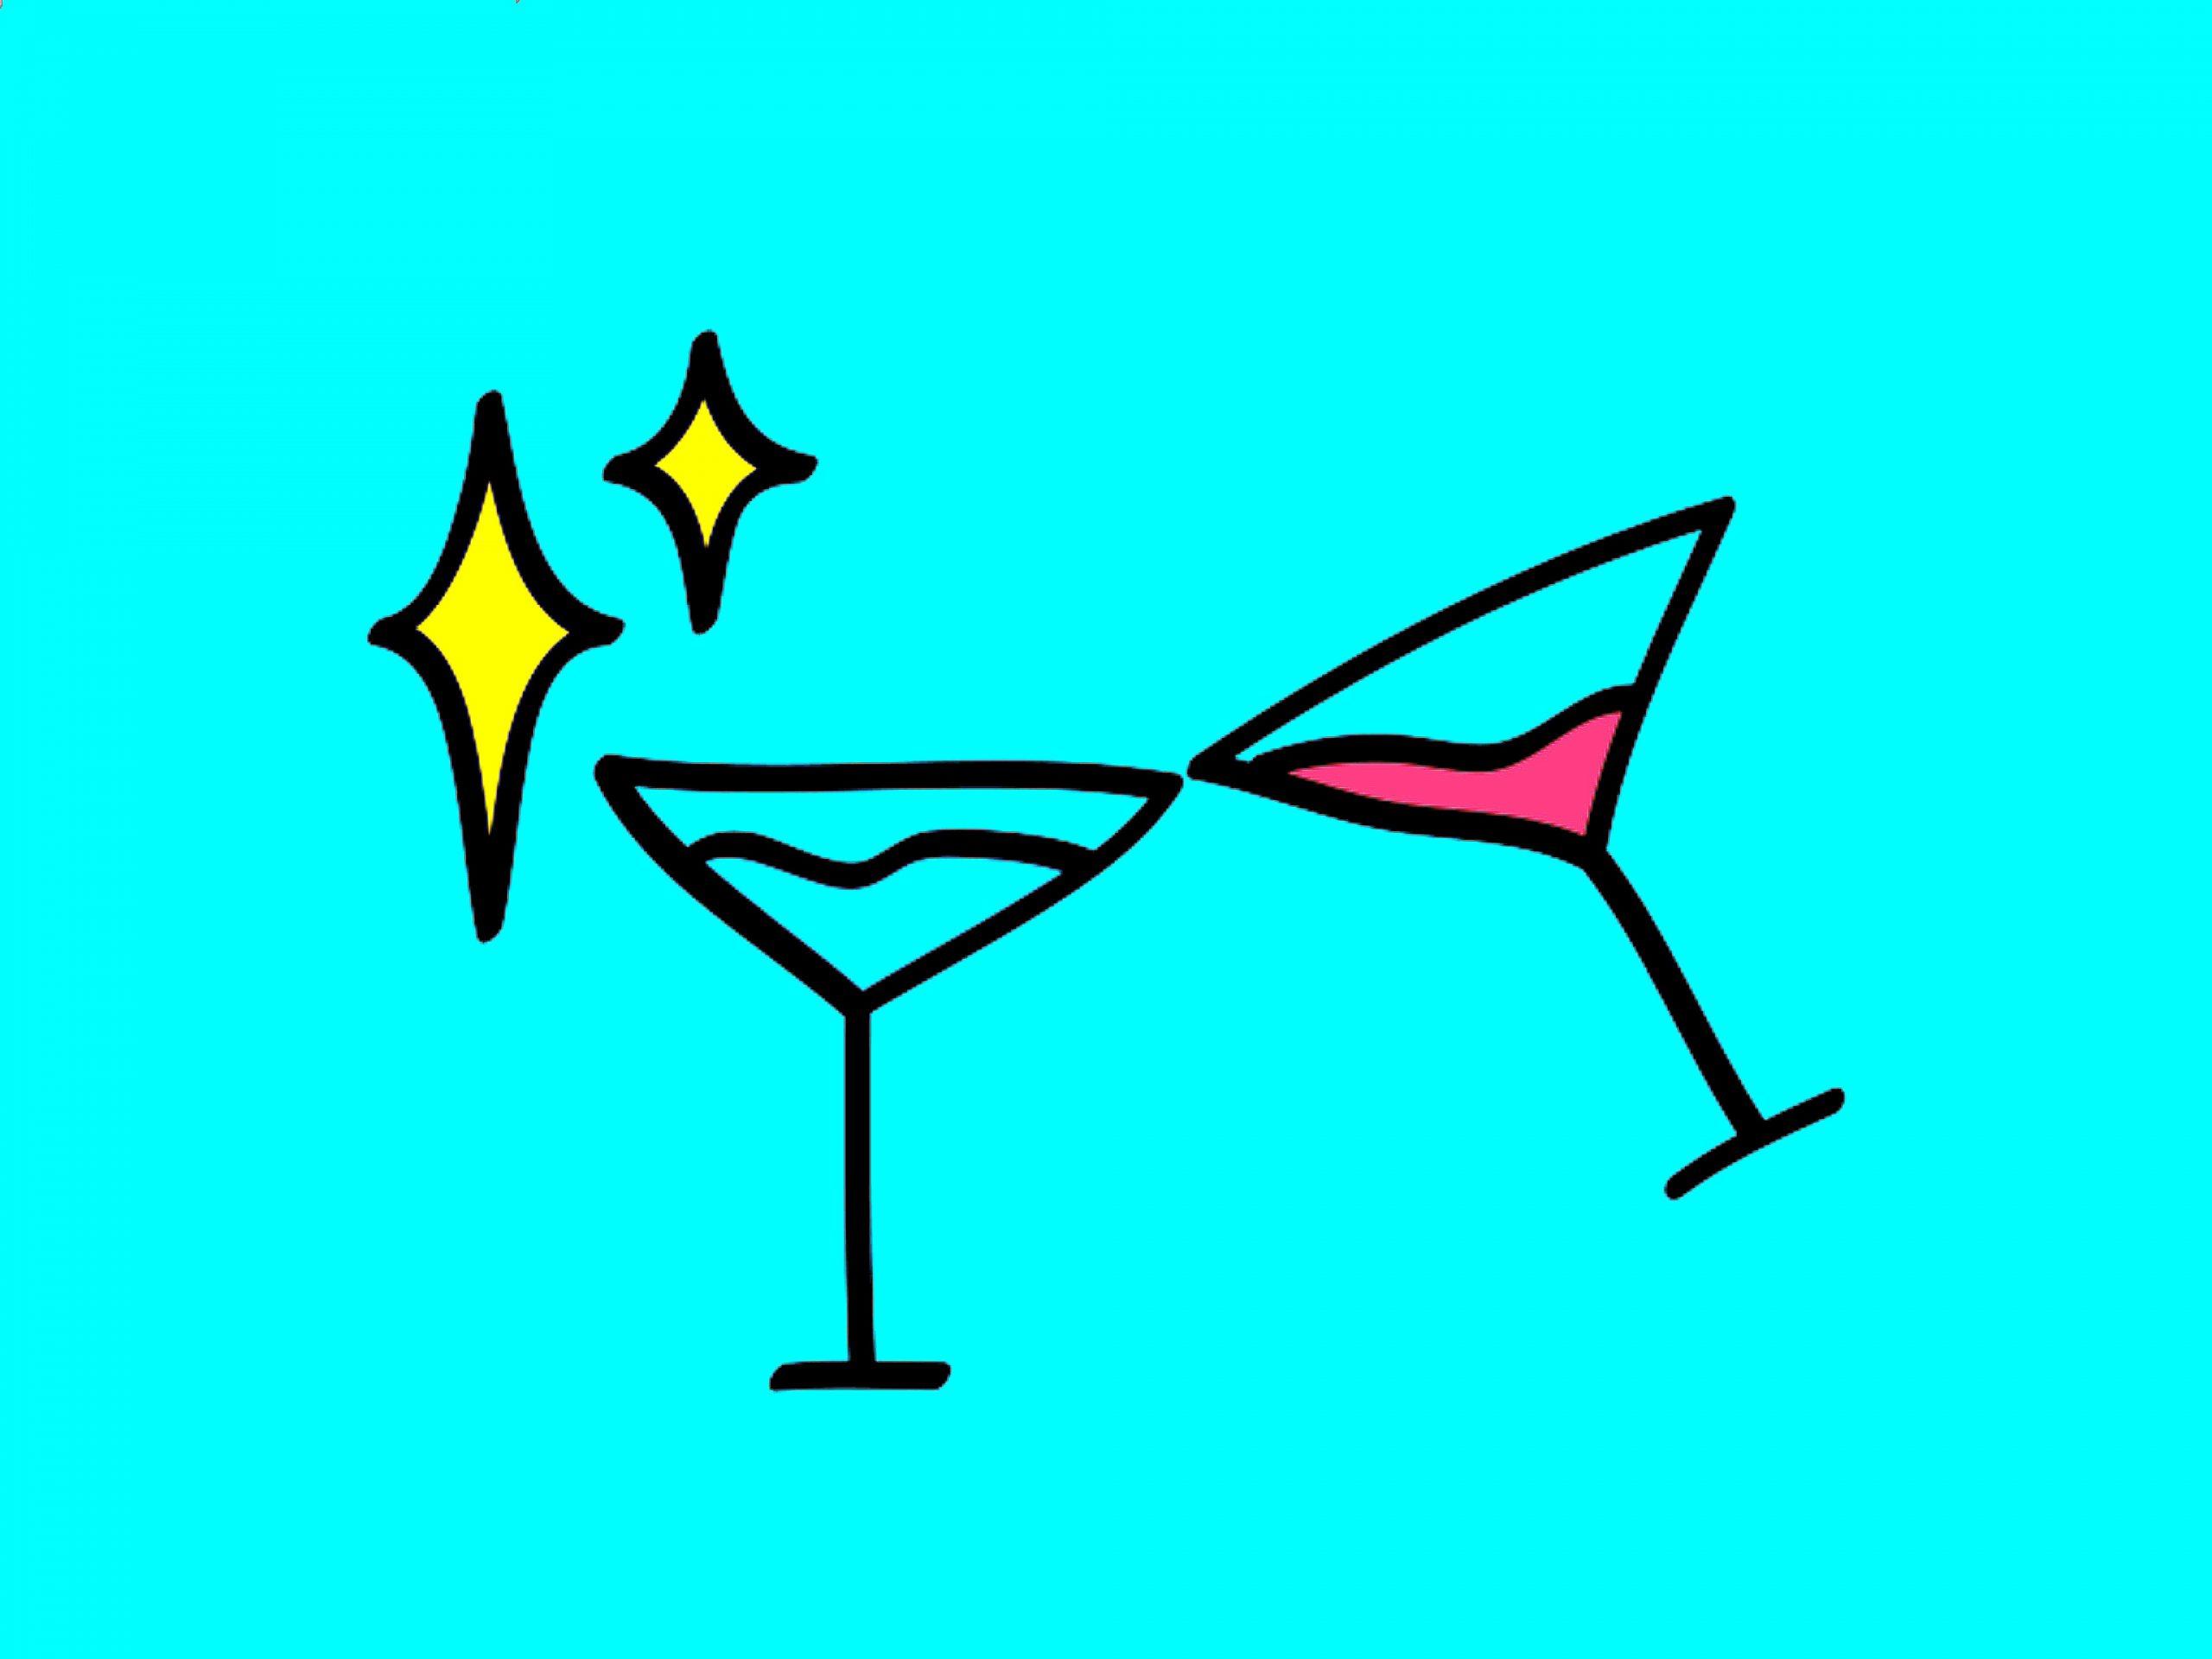 Illustration of juice glasses